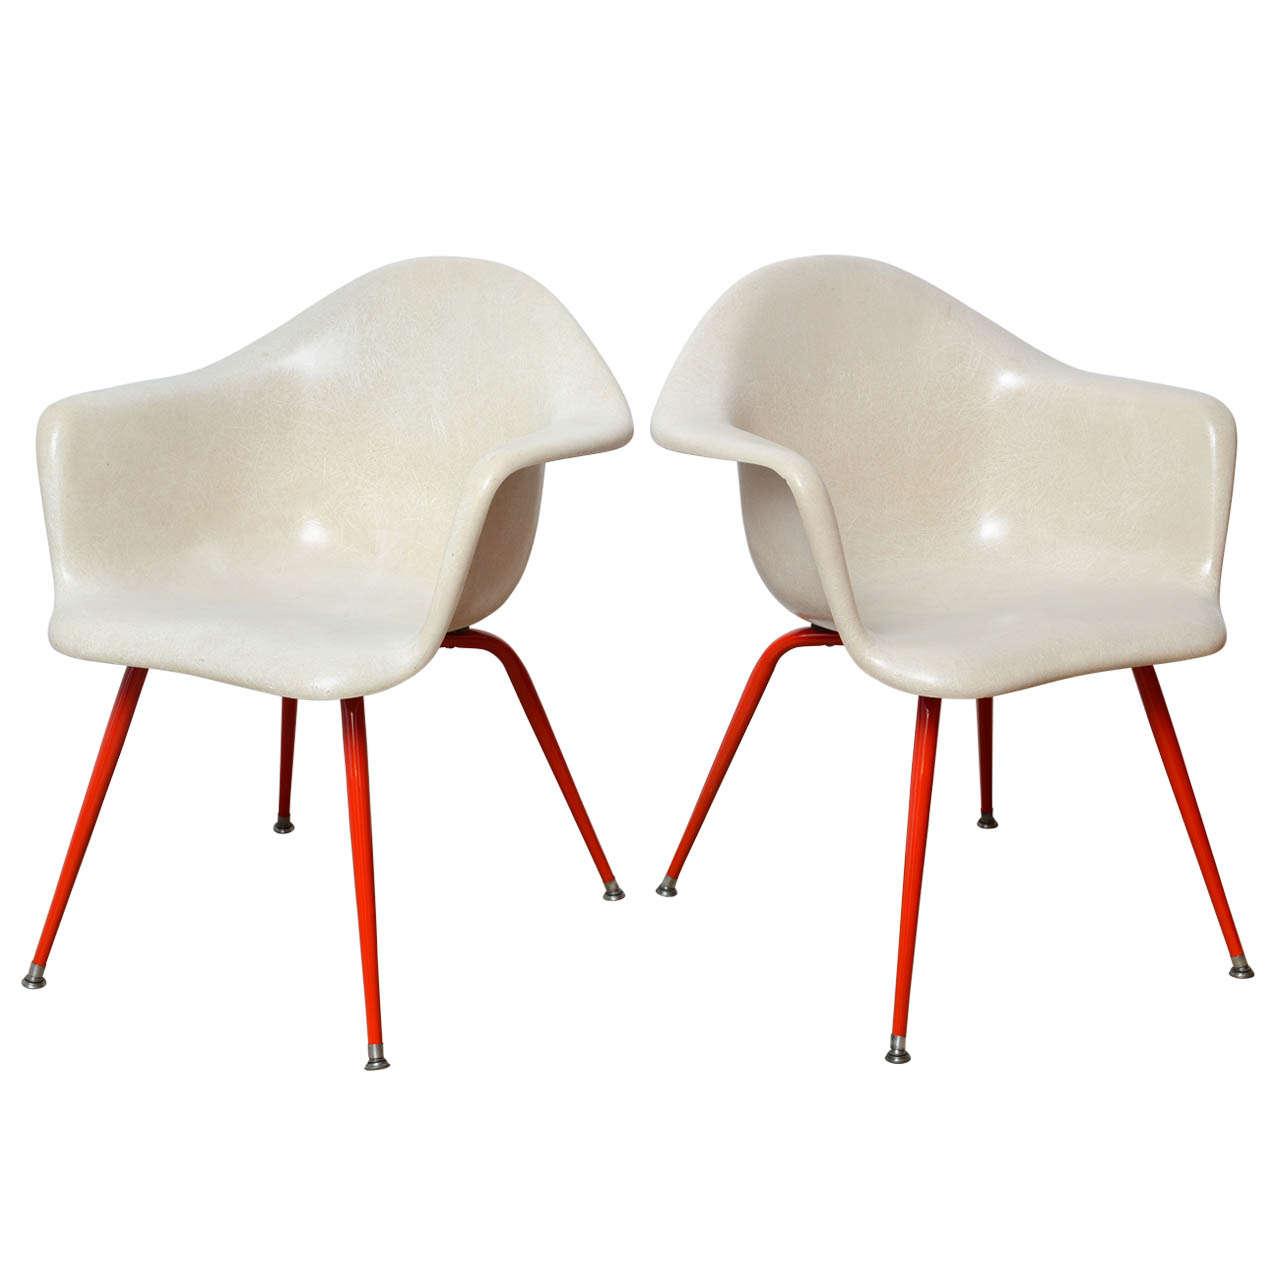 fiberglass shell chair cheap leather chairs x jpg